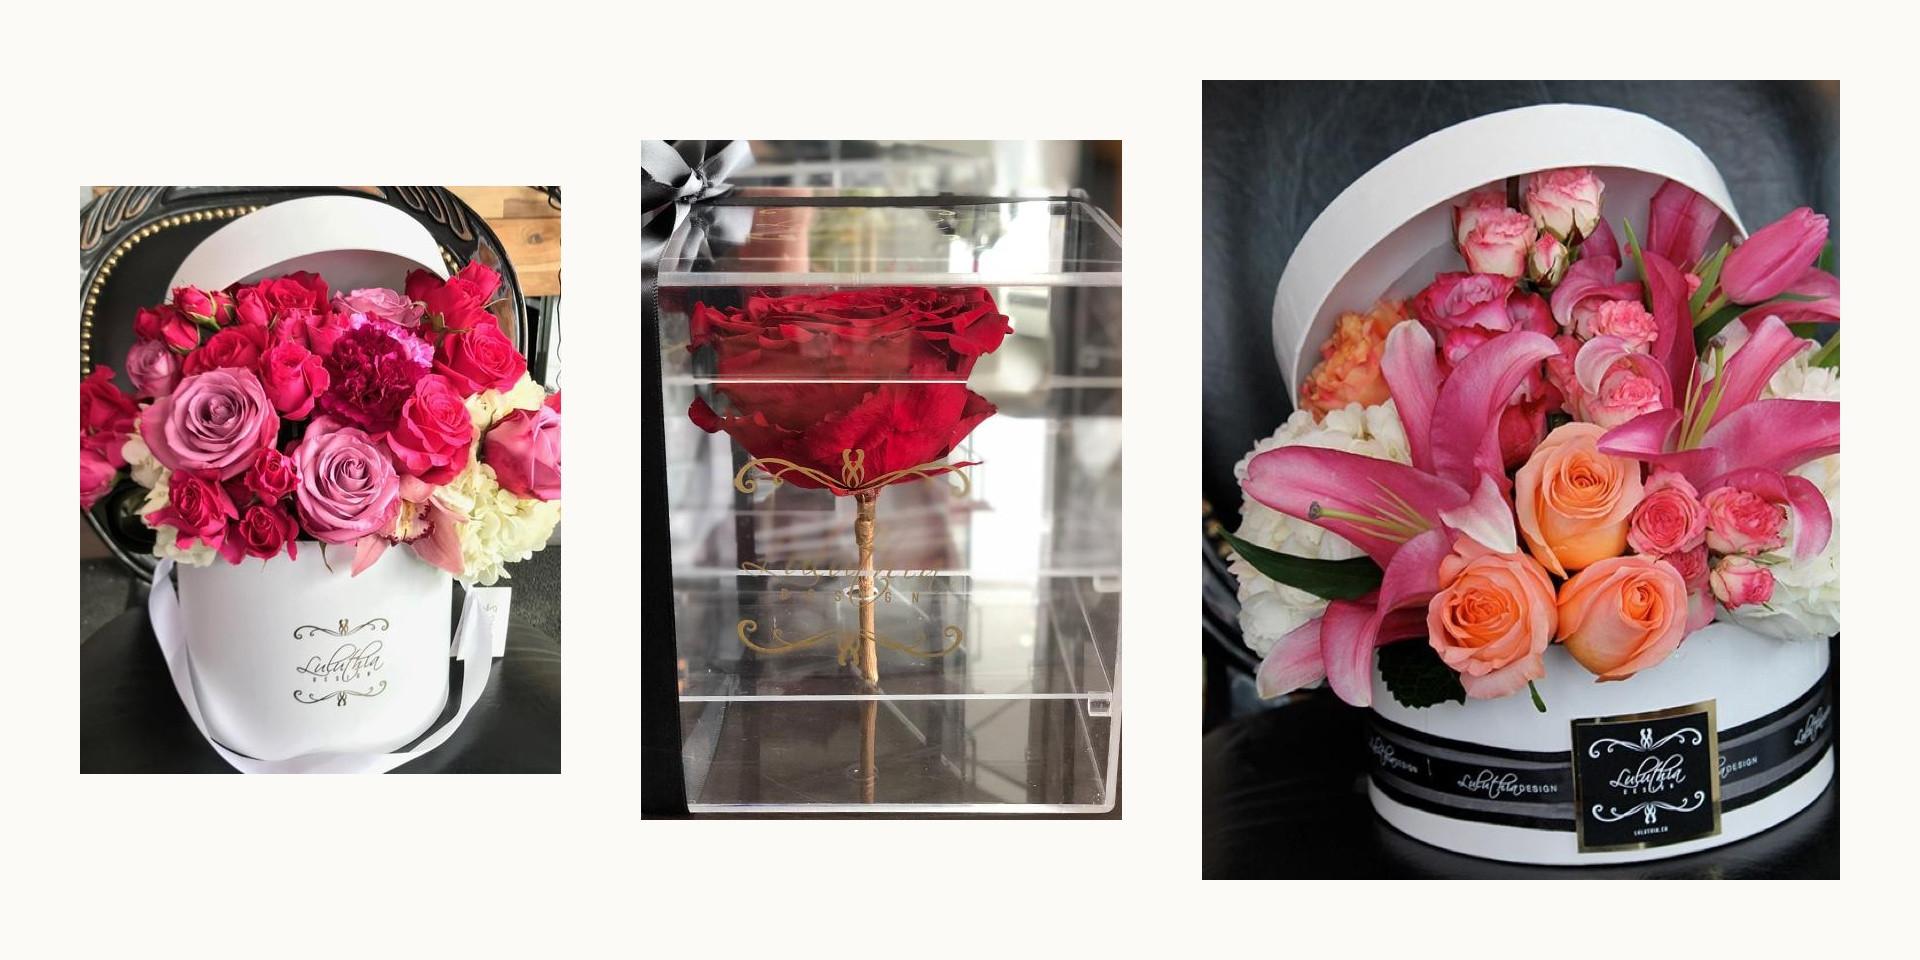 Roses de Saint-Valentin Luluthia Design - Rockland